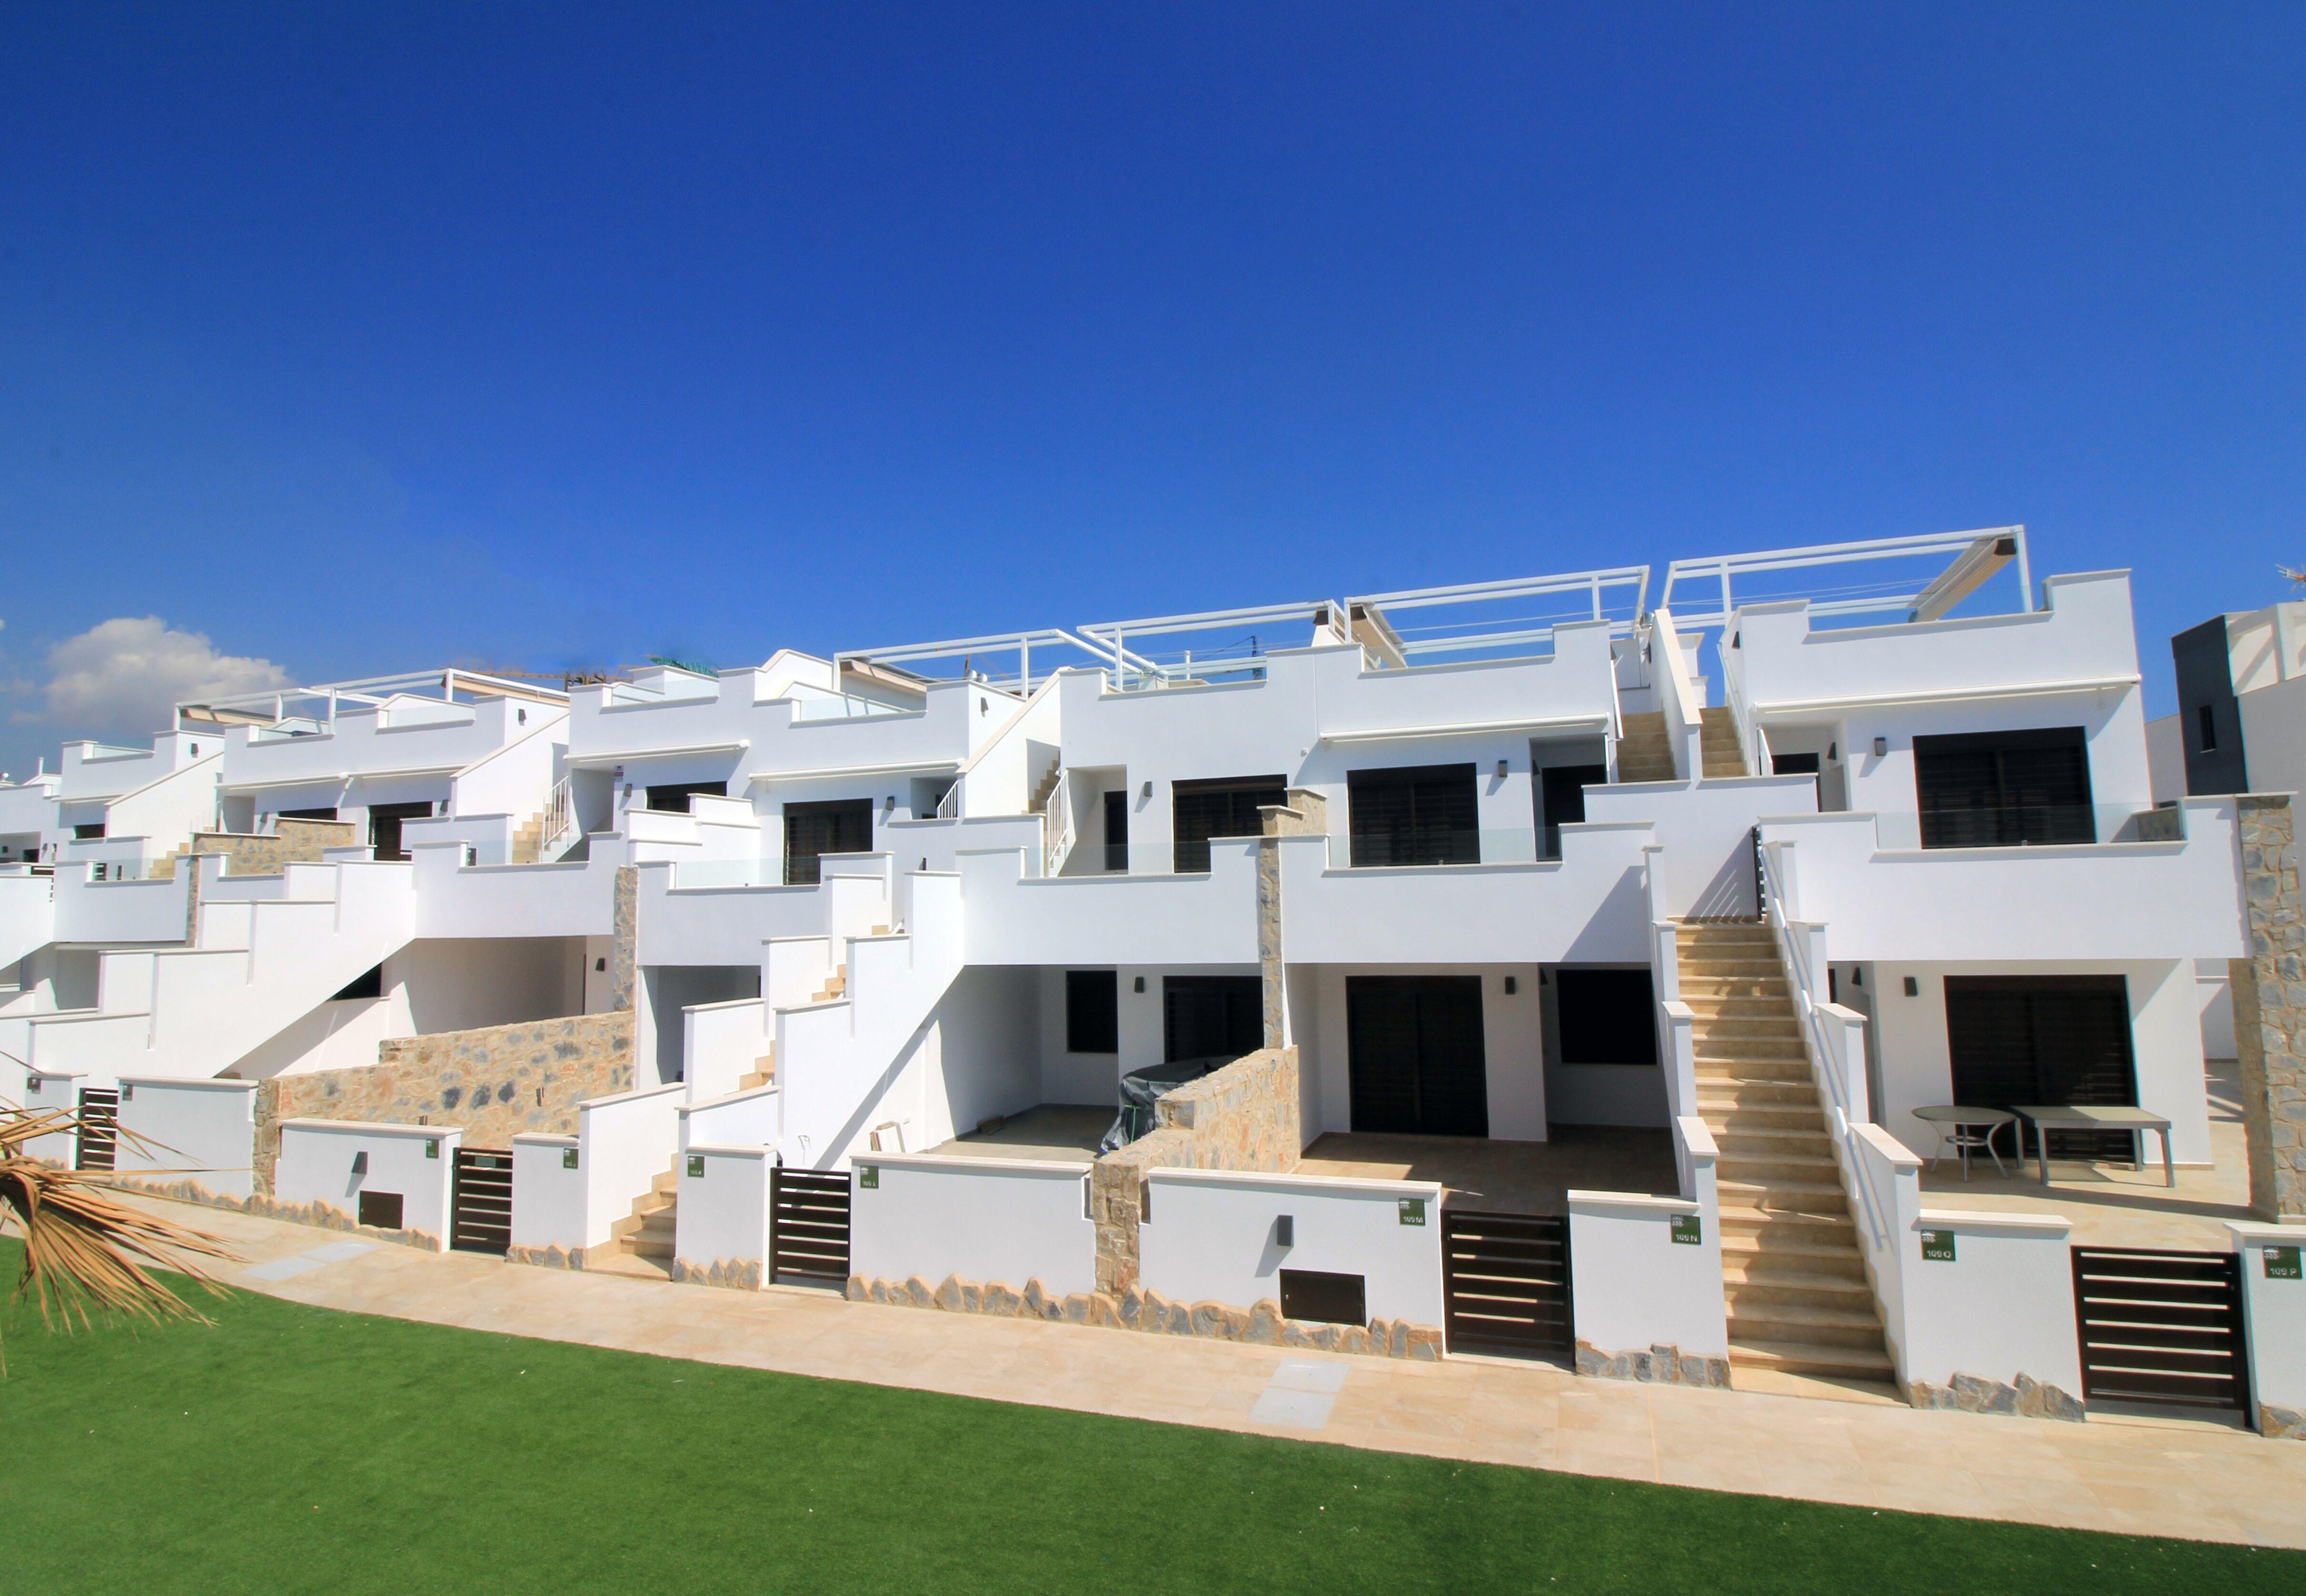 kf943646: Apartment for sale in Torre de la Horadada